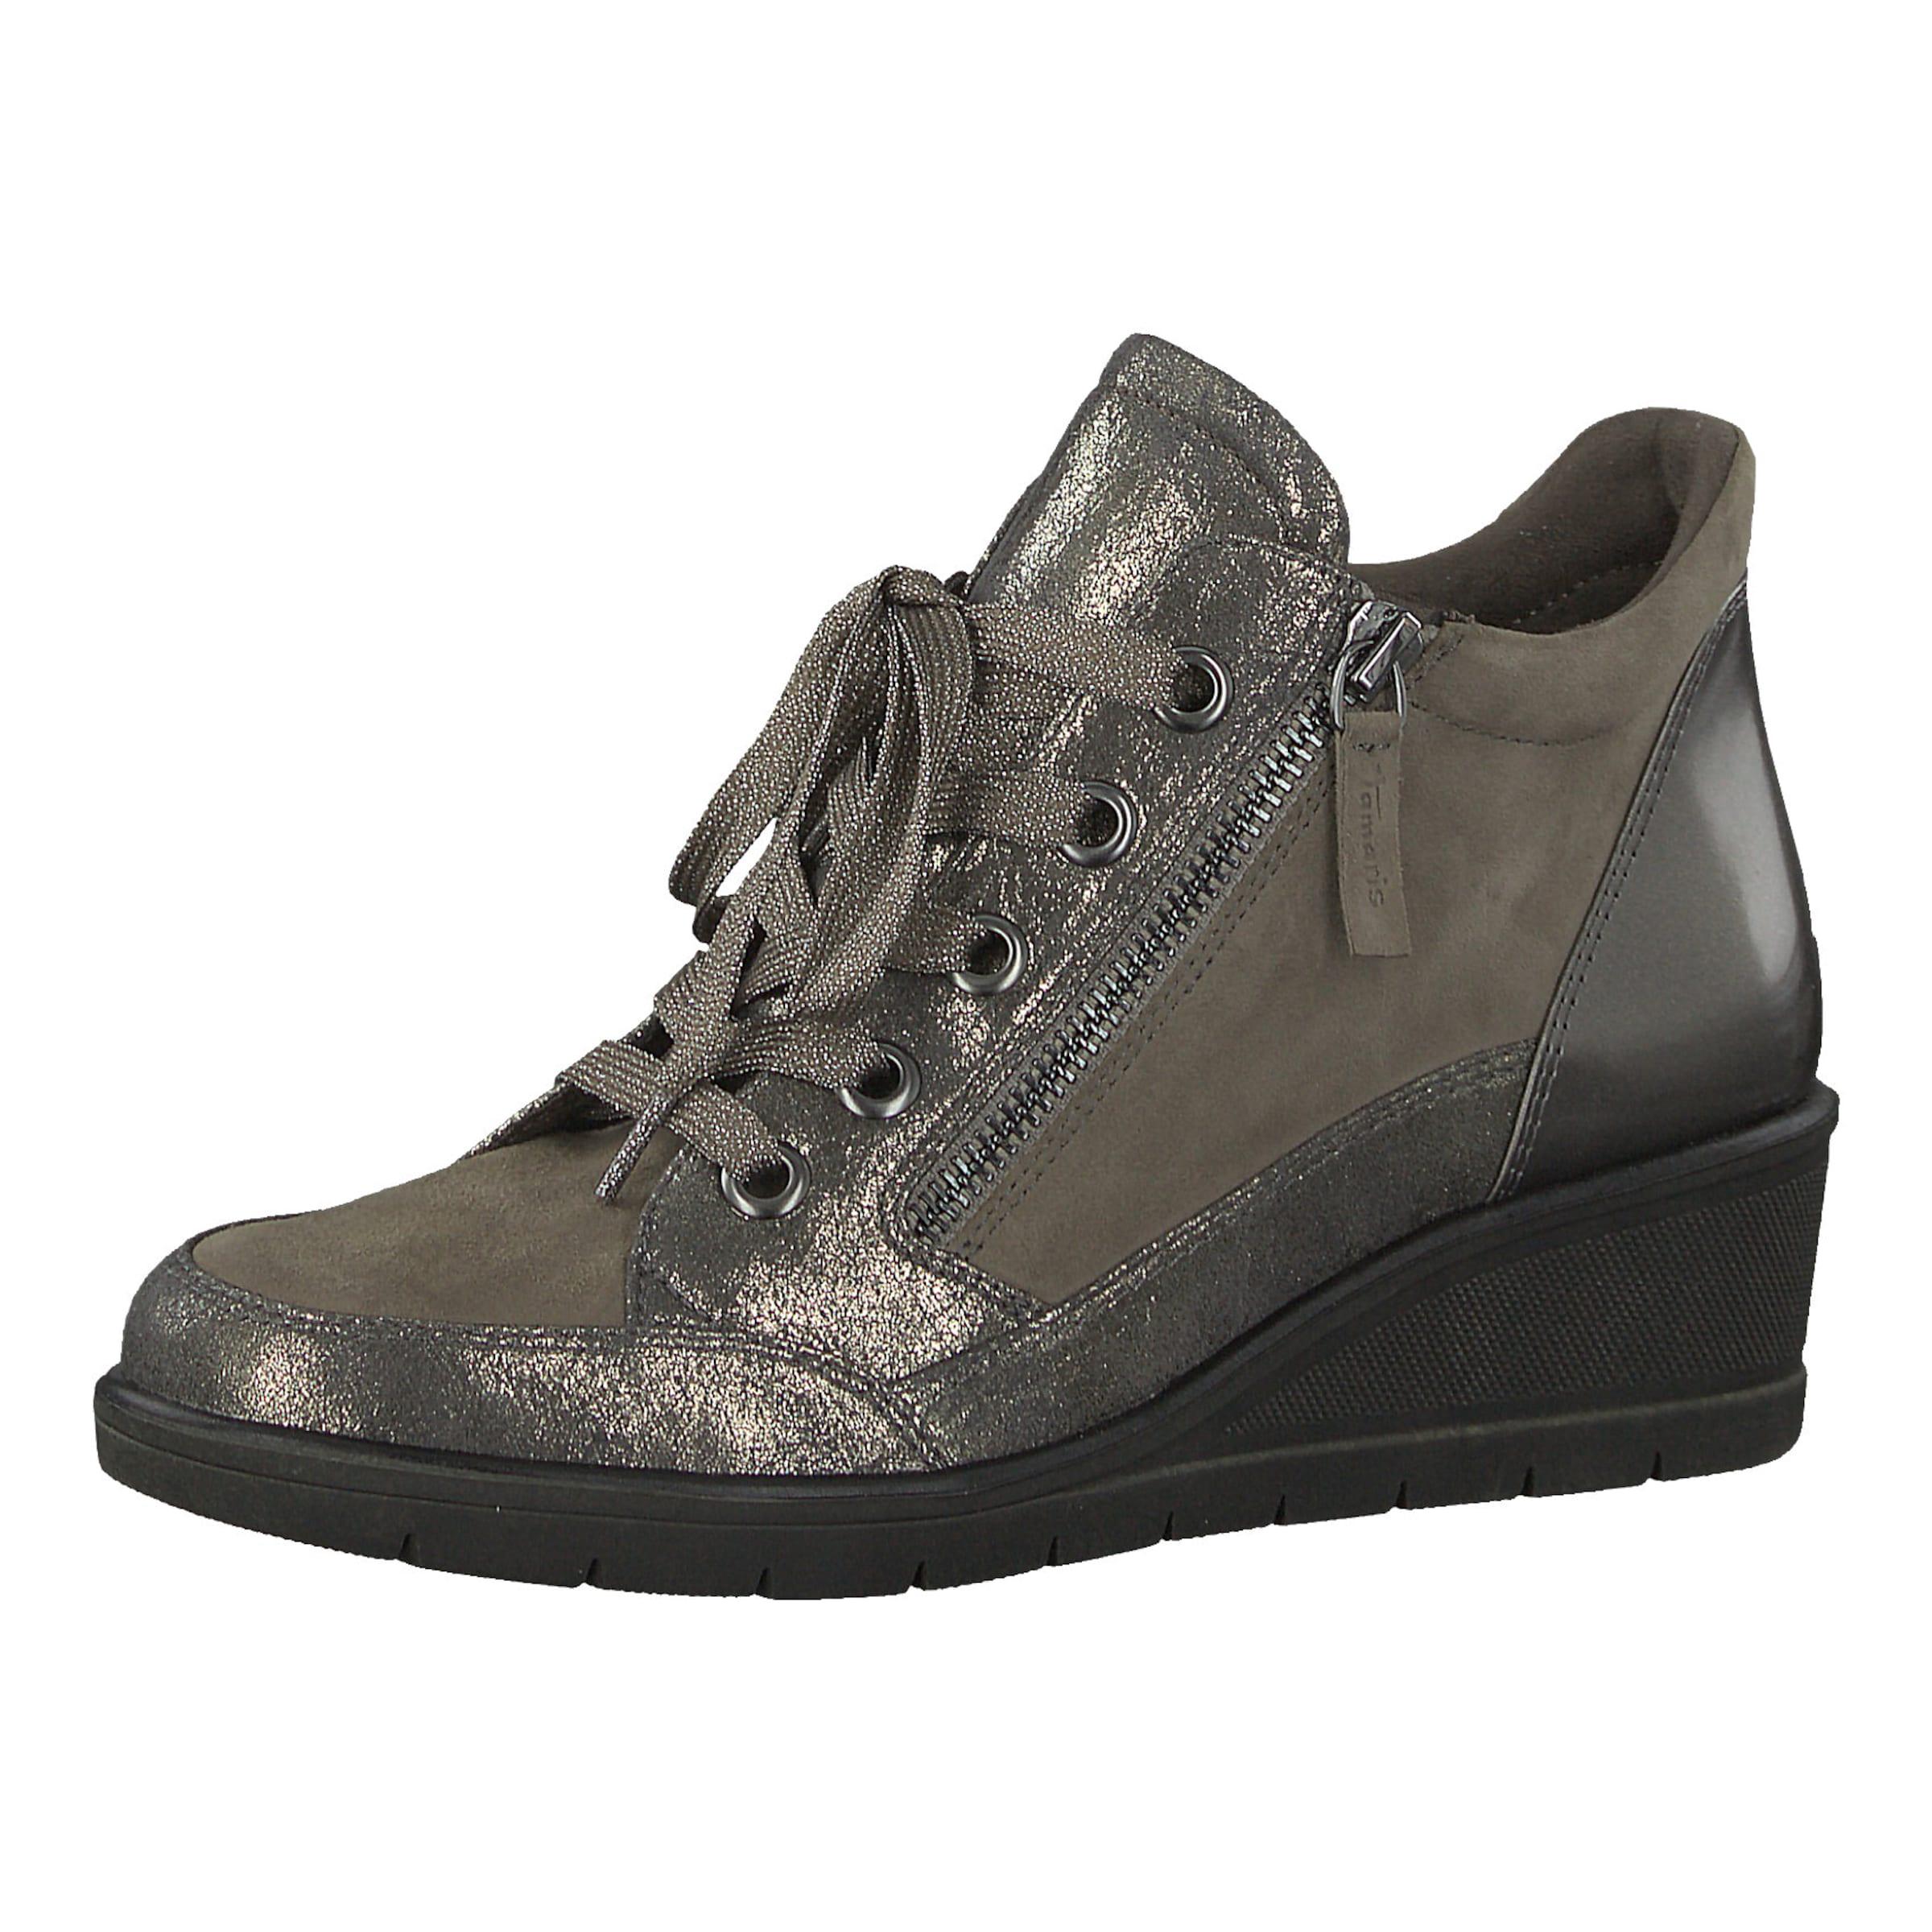 TAMARIS Sneakers Günstige und langlebige Schuhe